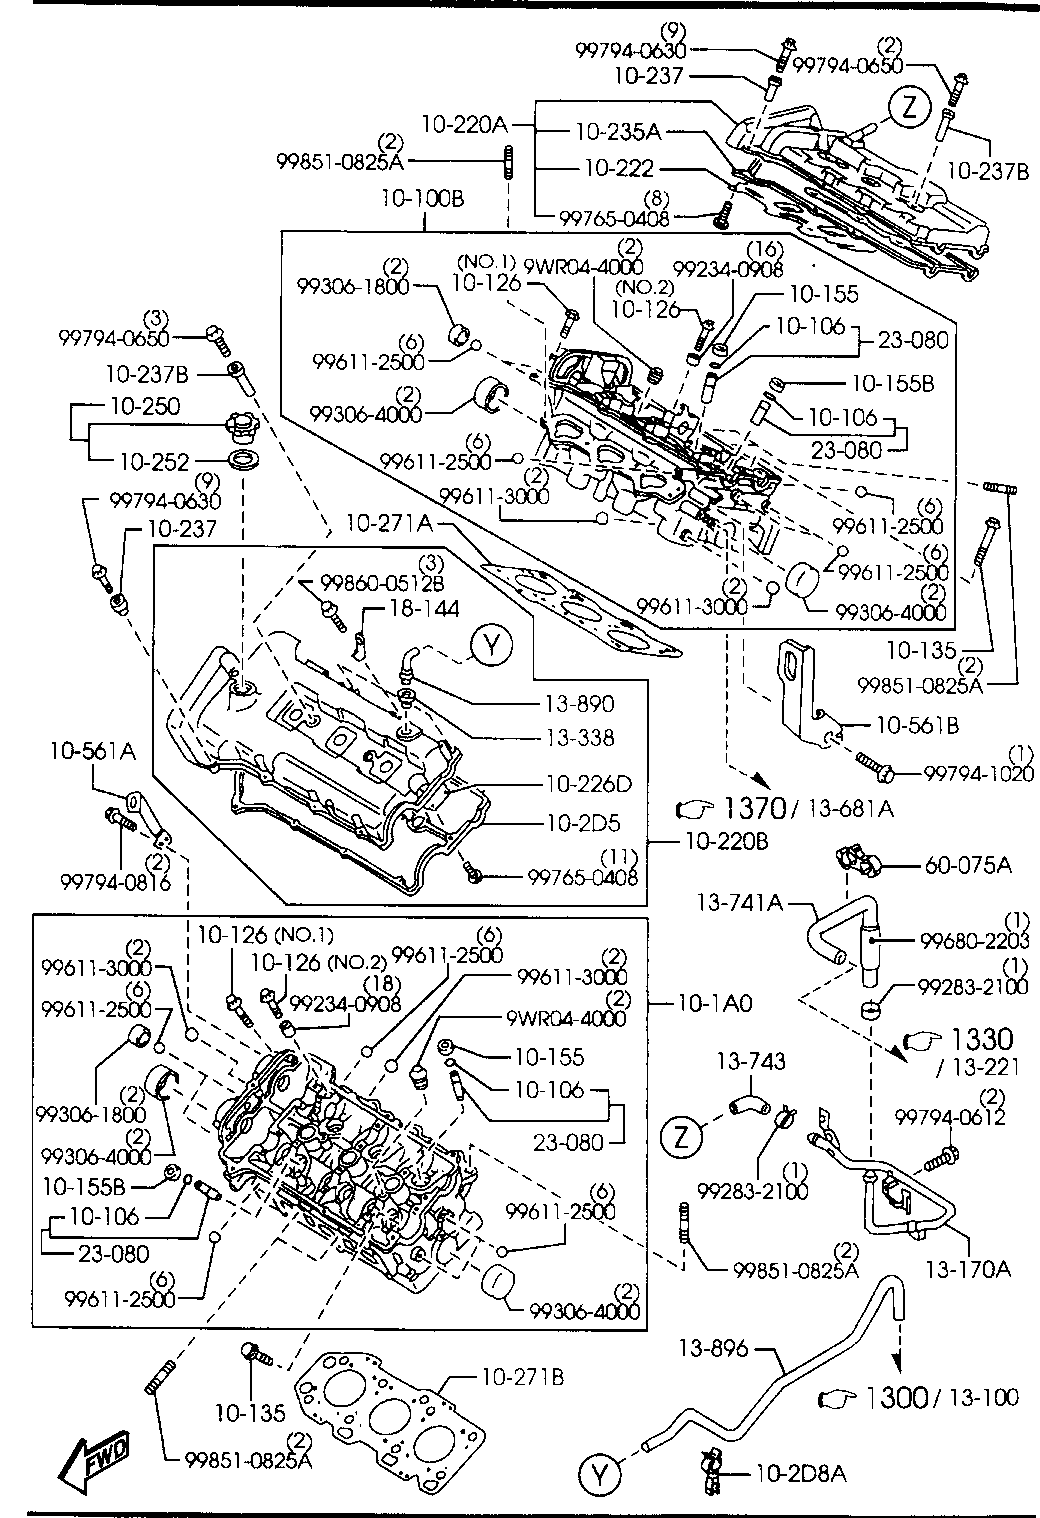 1999 Millenia Gasoline Engine V6 Cylinder Transmission 1010b Head Diagram